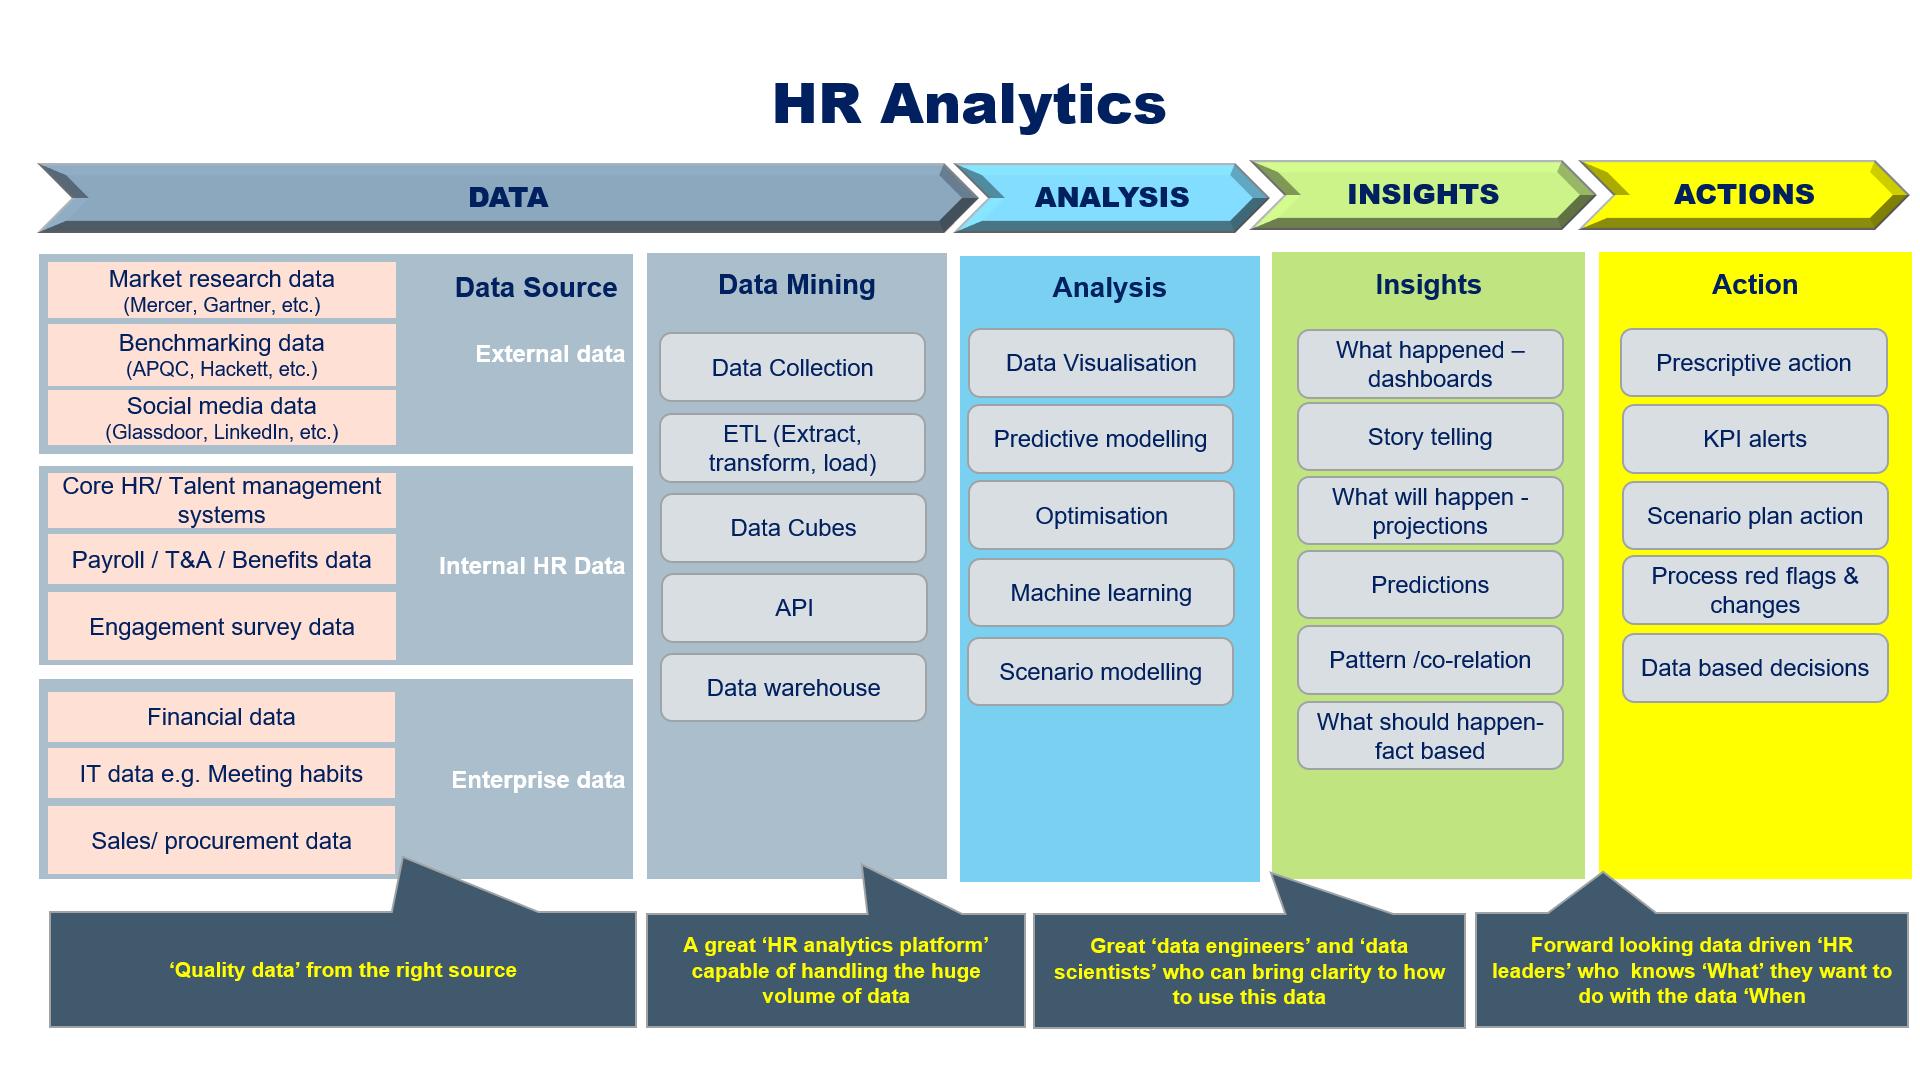 HR analytics unleashing value